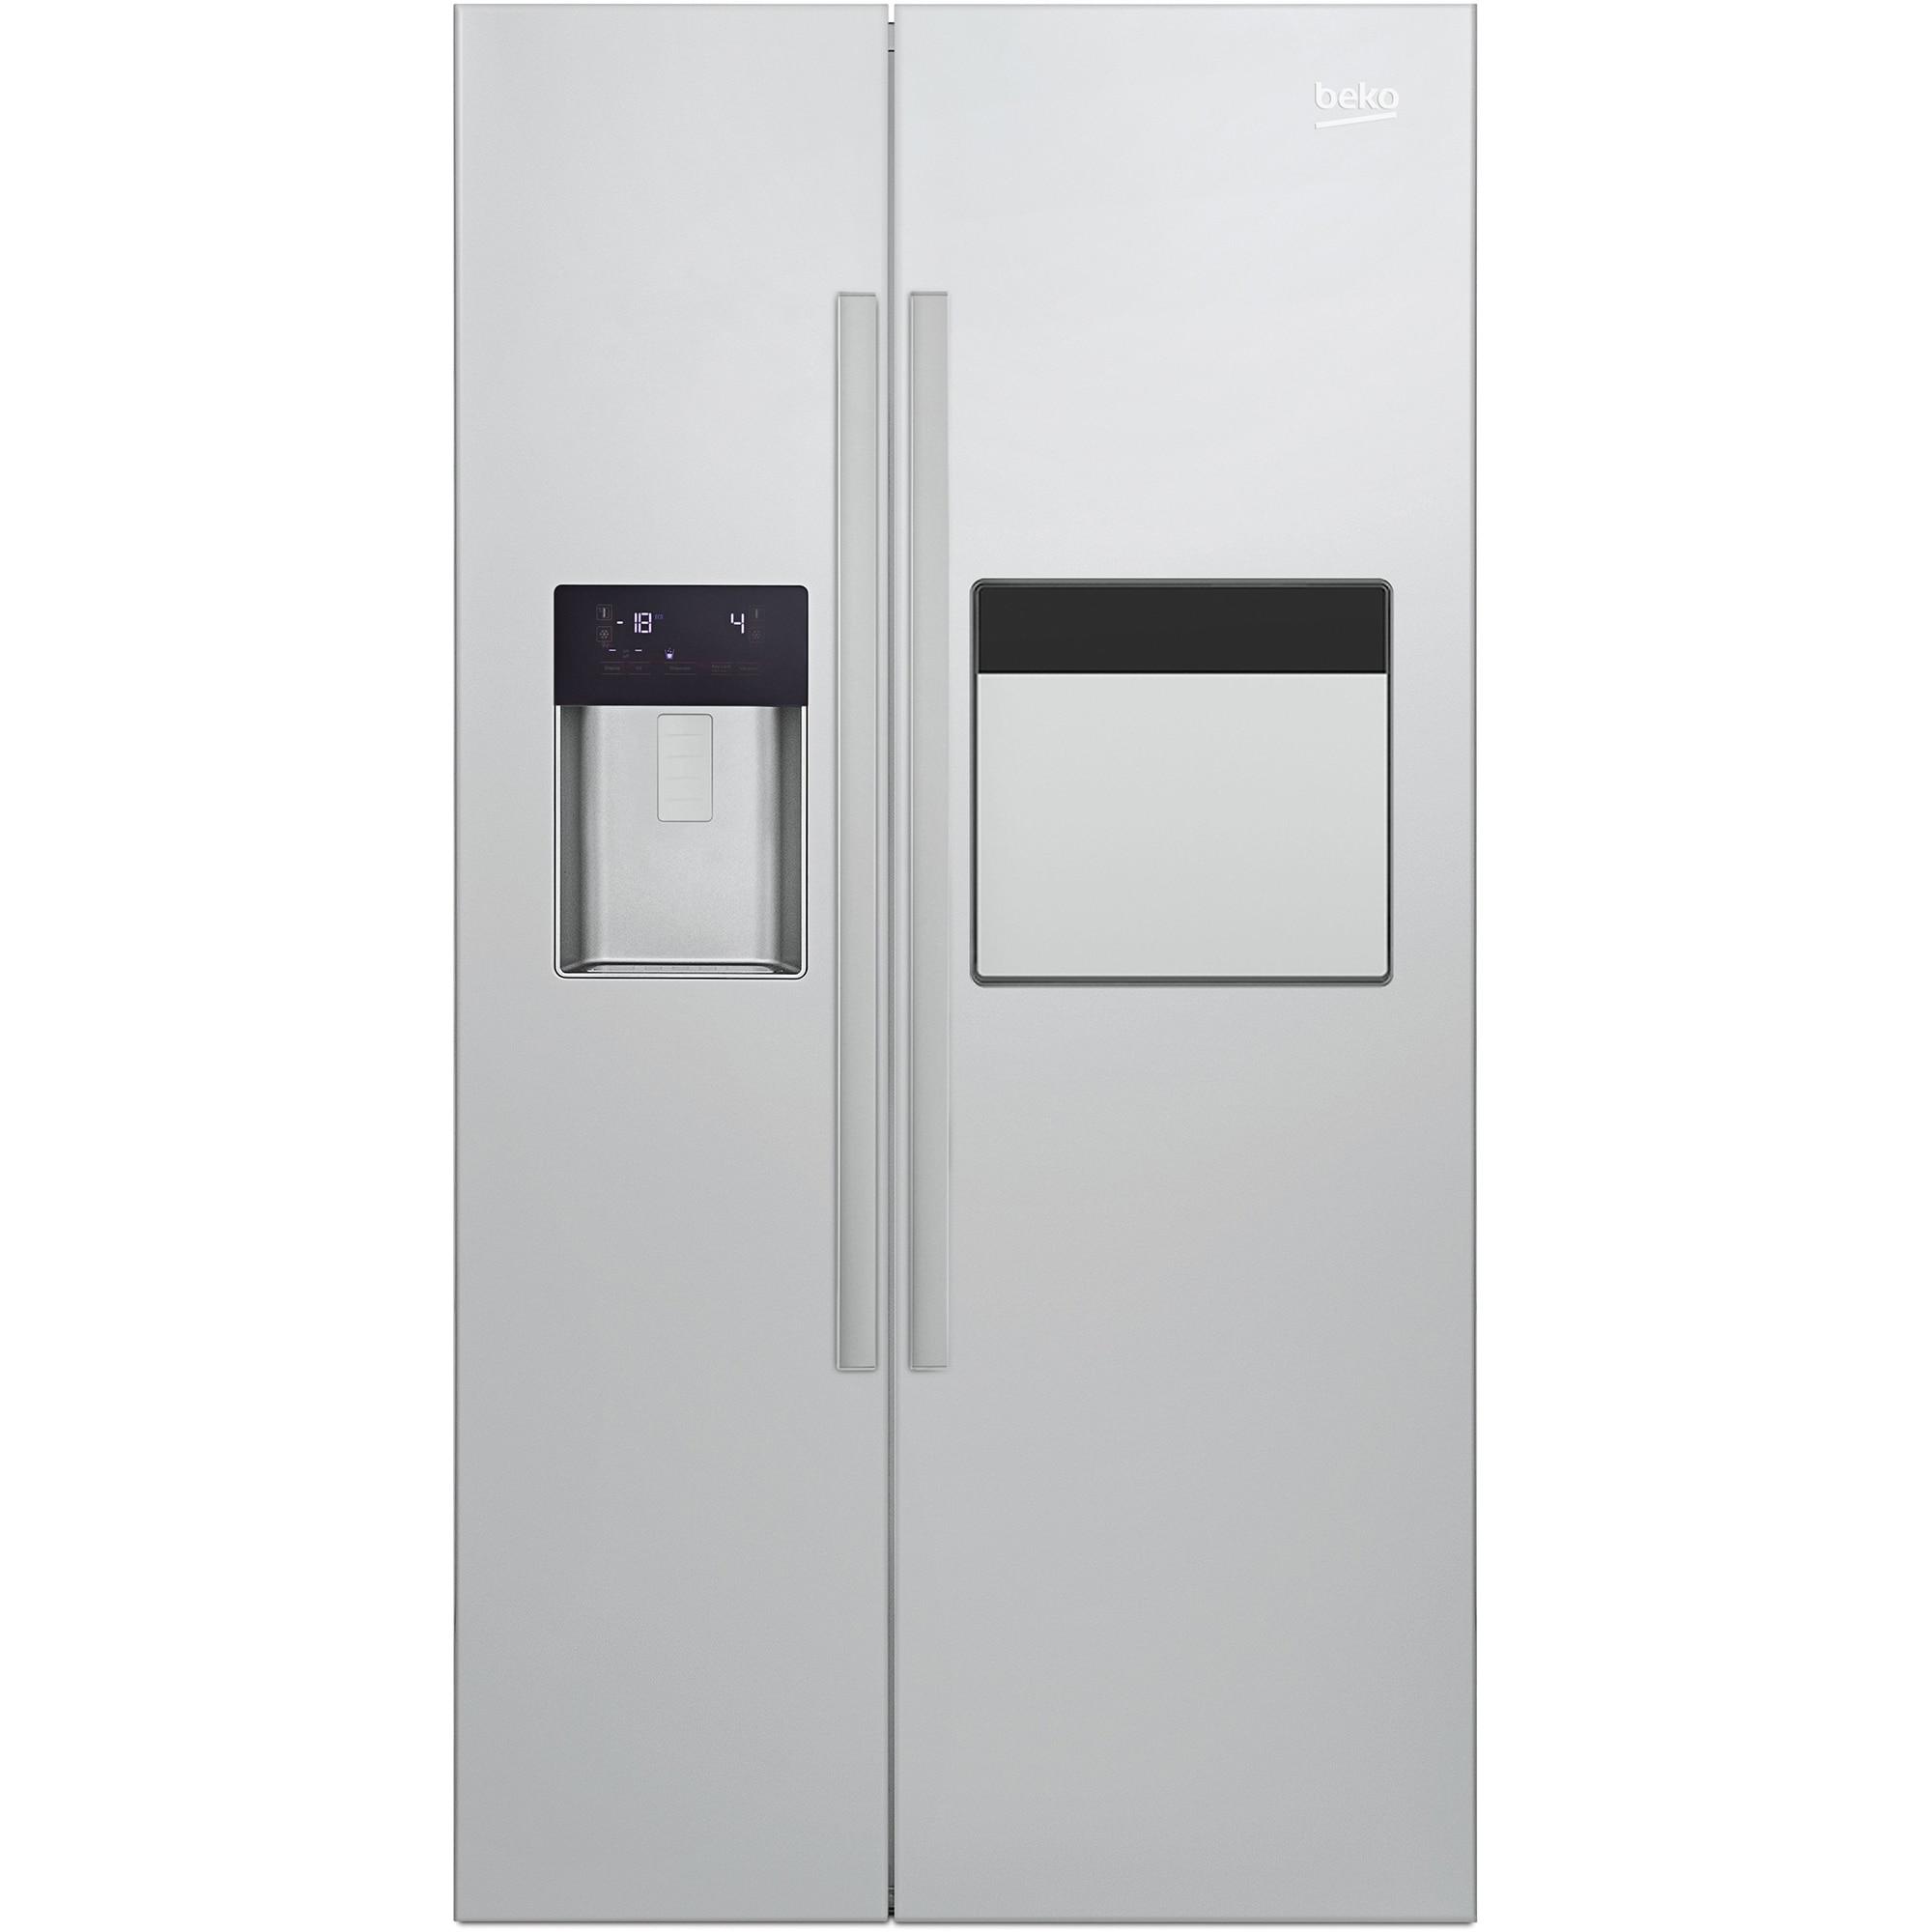 Fotografie Side by side Beko GN162431ZX, 544 l, Clasa A++, NeoFrost™ dual cooling, H 179 cm, Inox antiamprenta